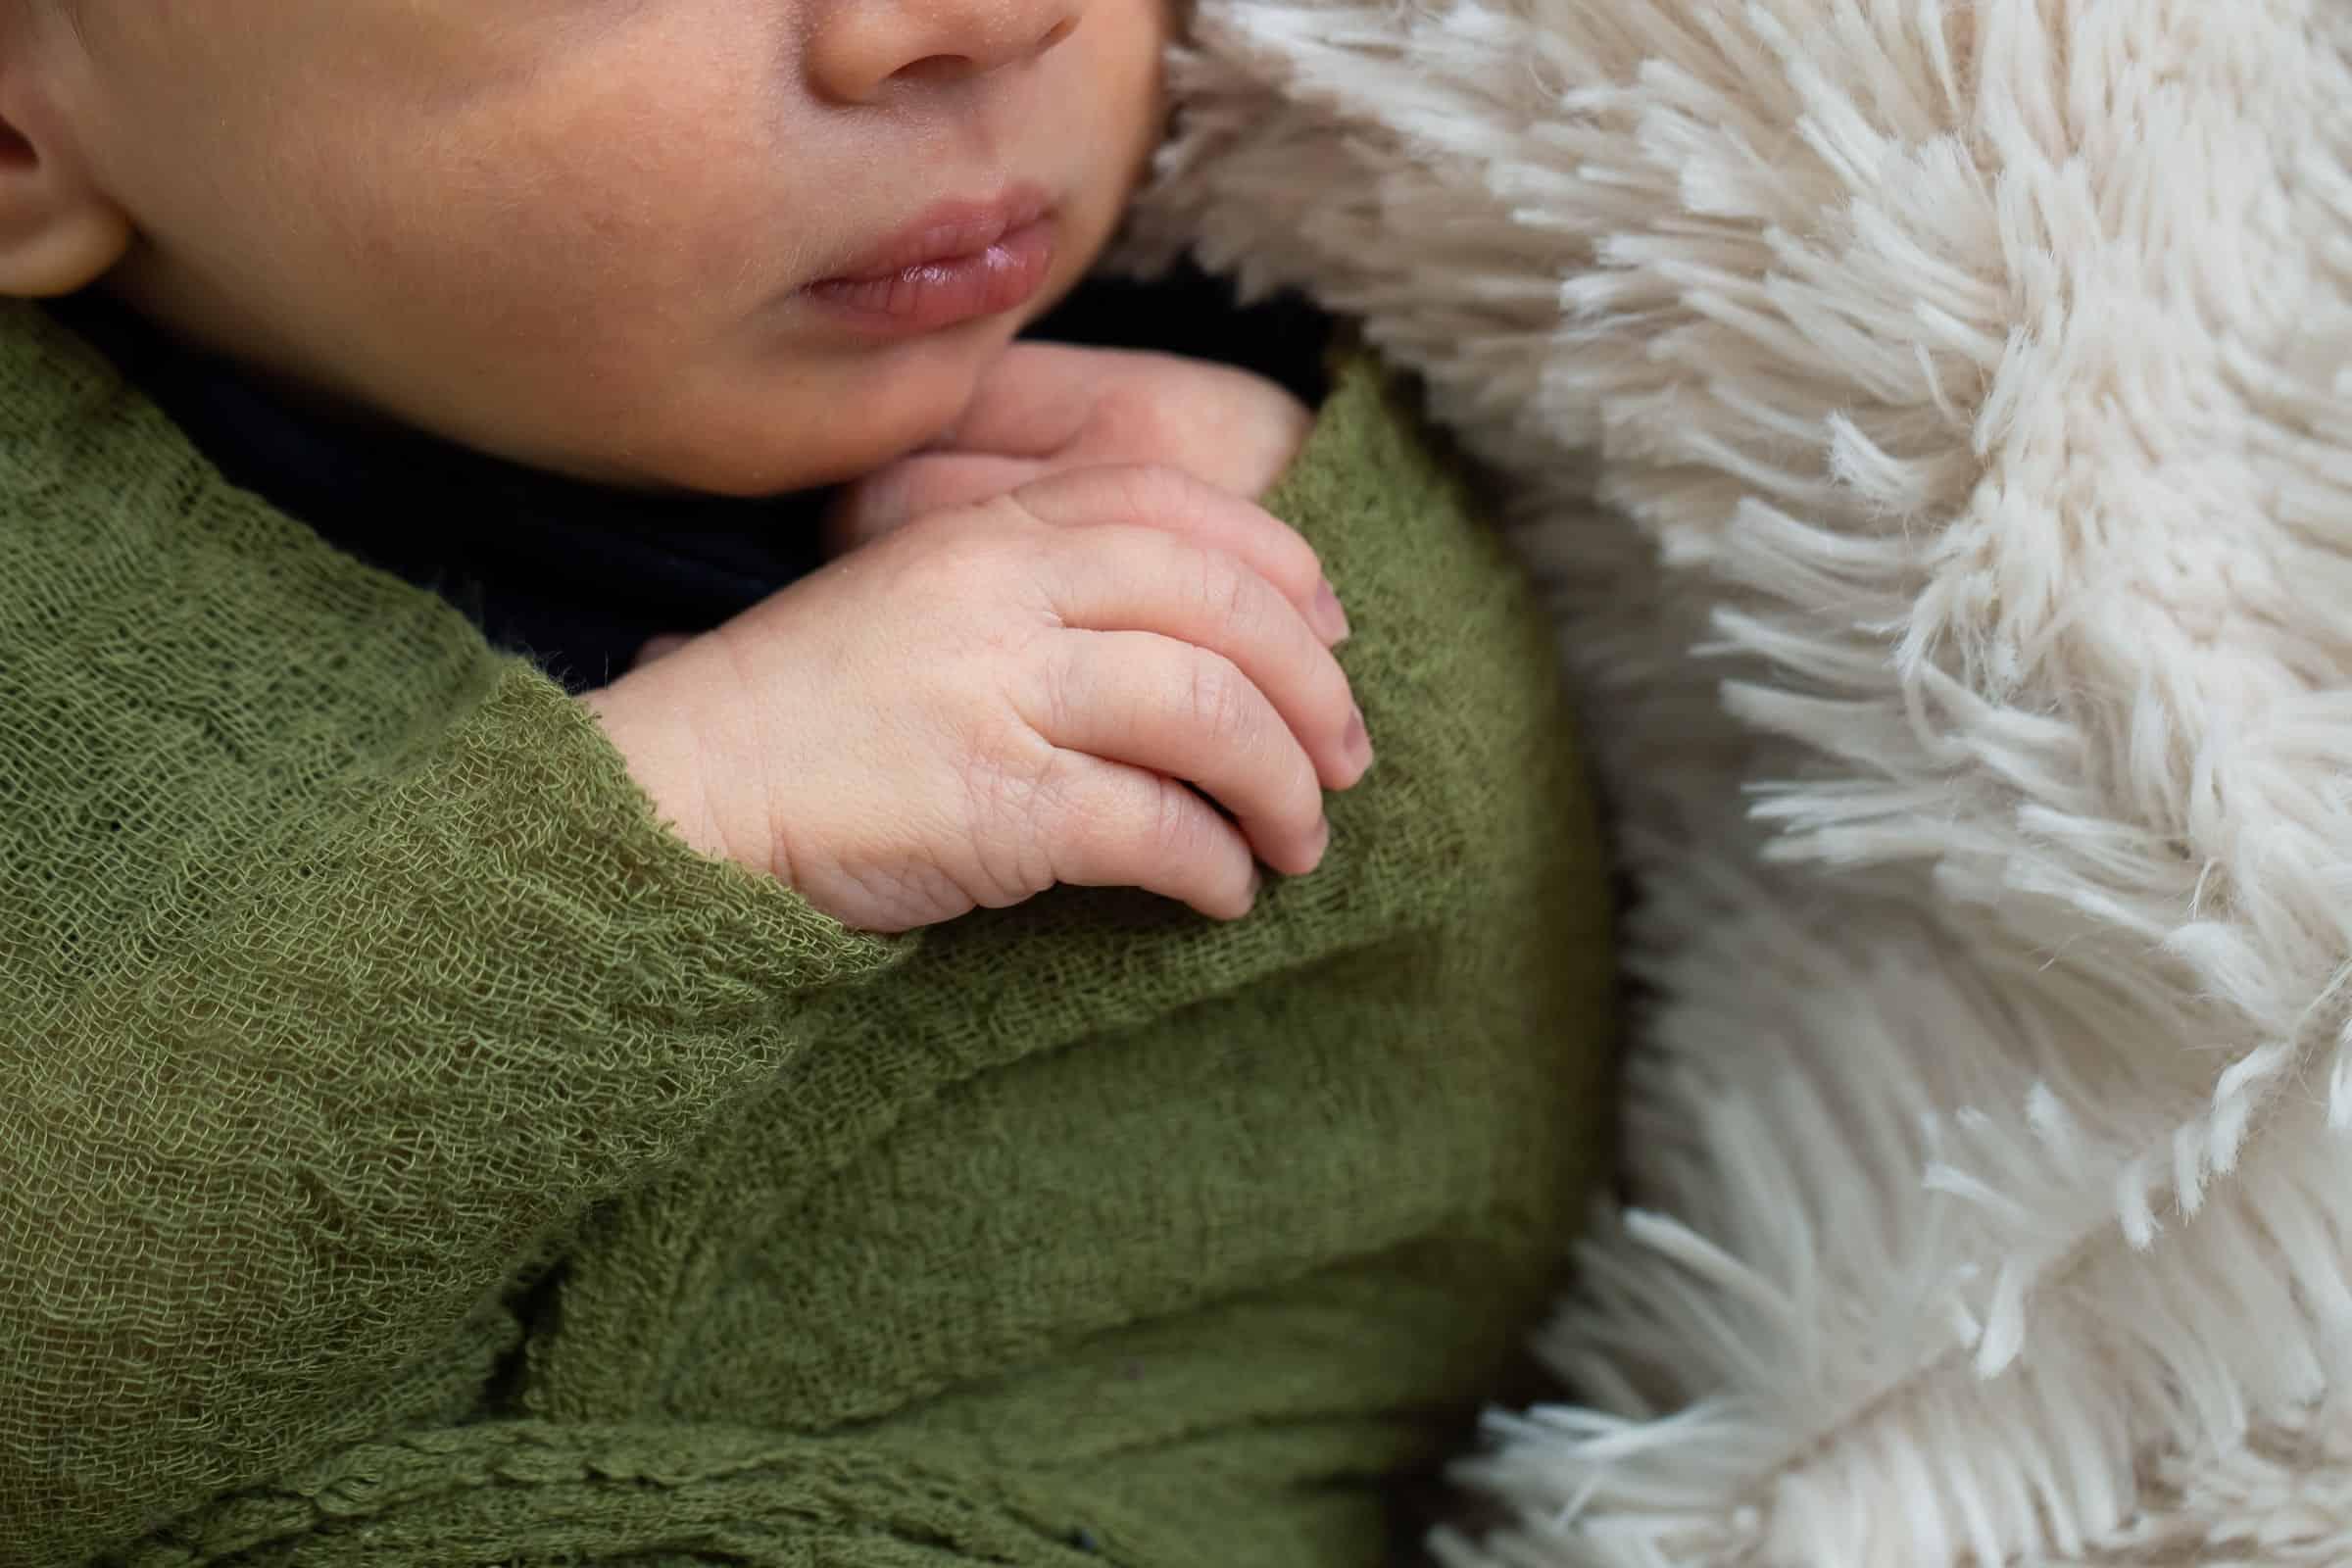 close up of sleeping newborn hand and lips